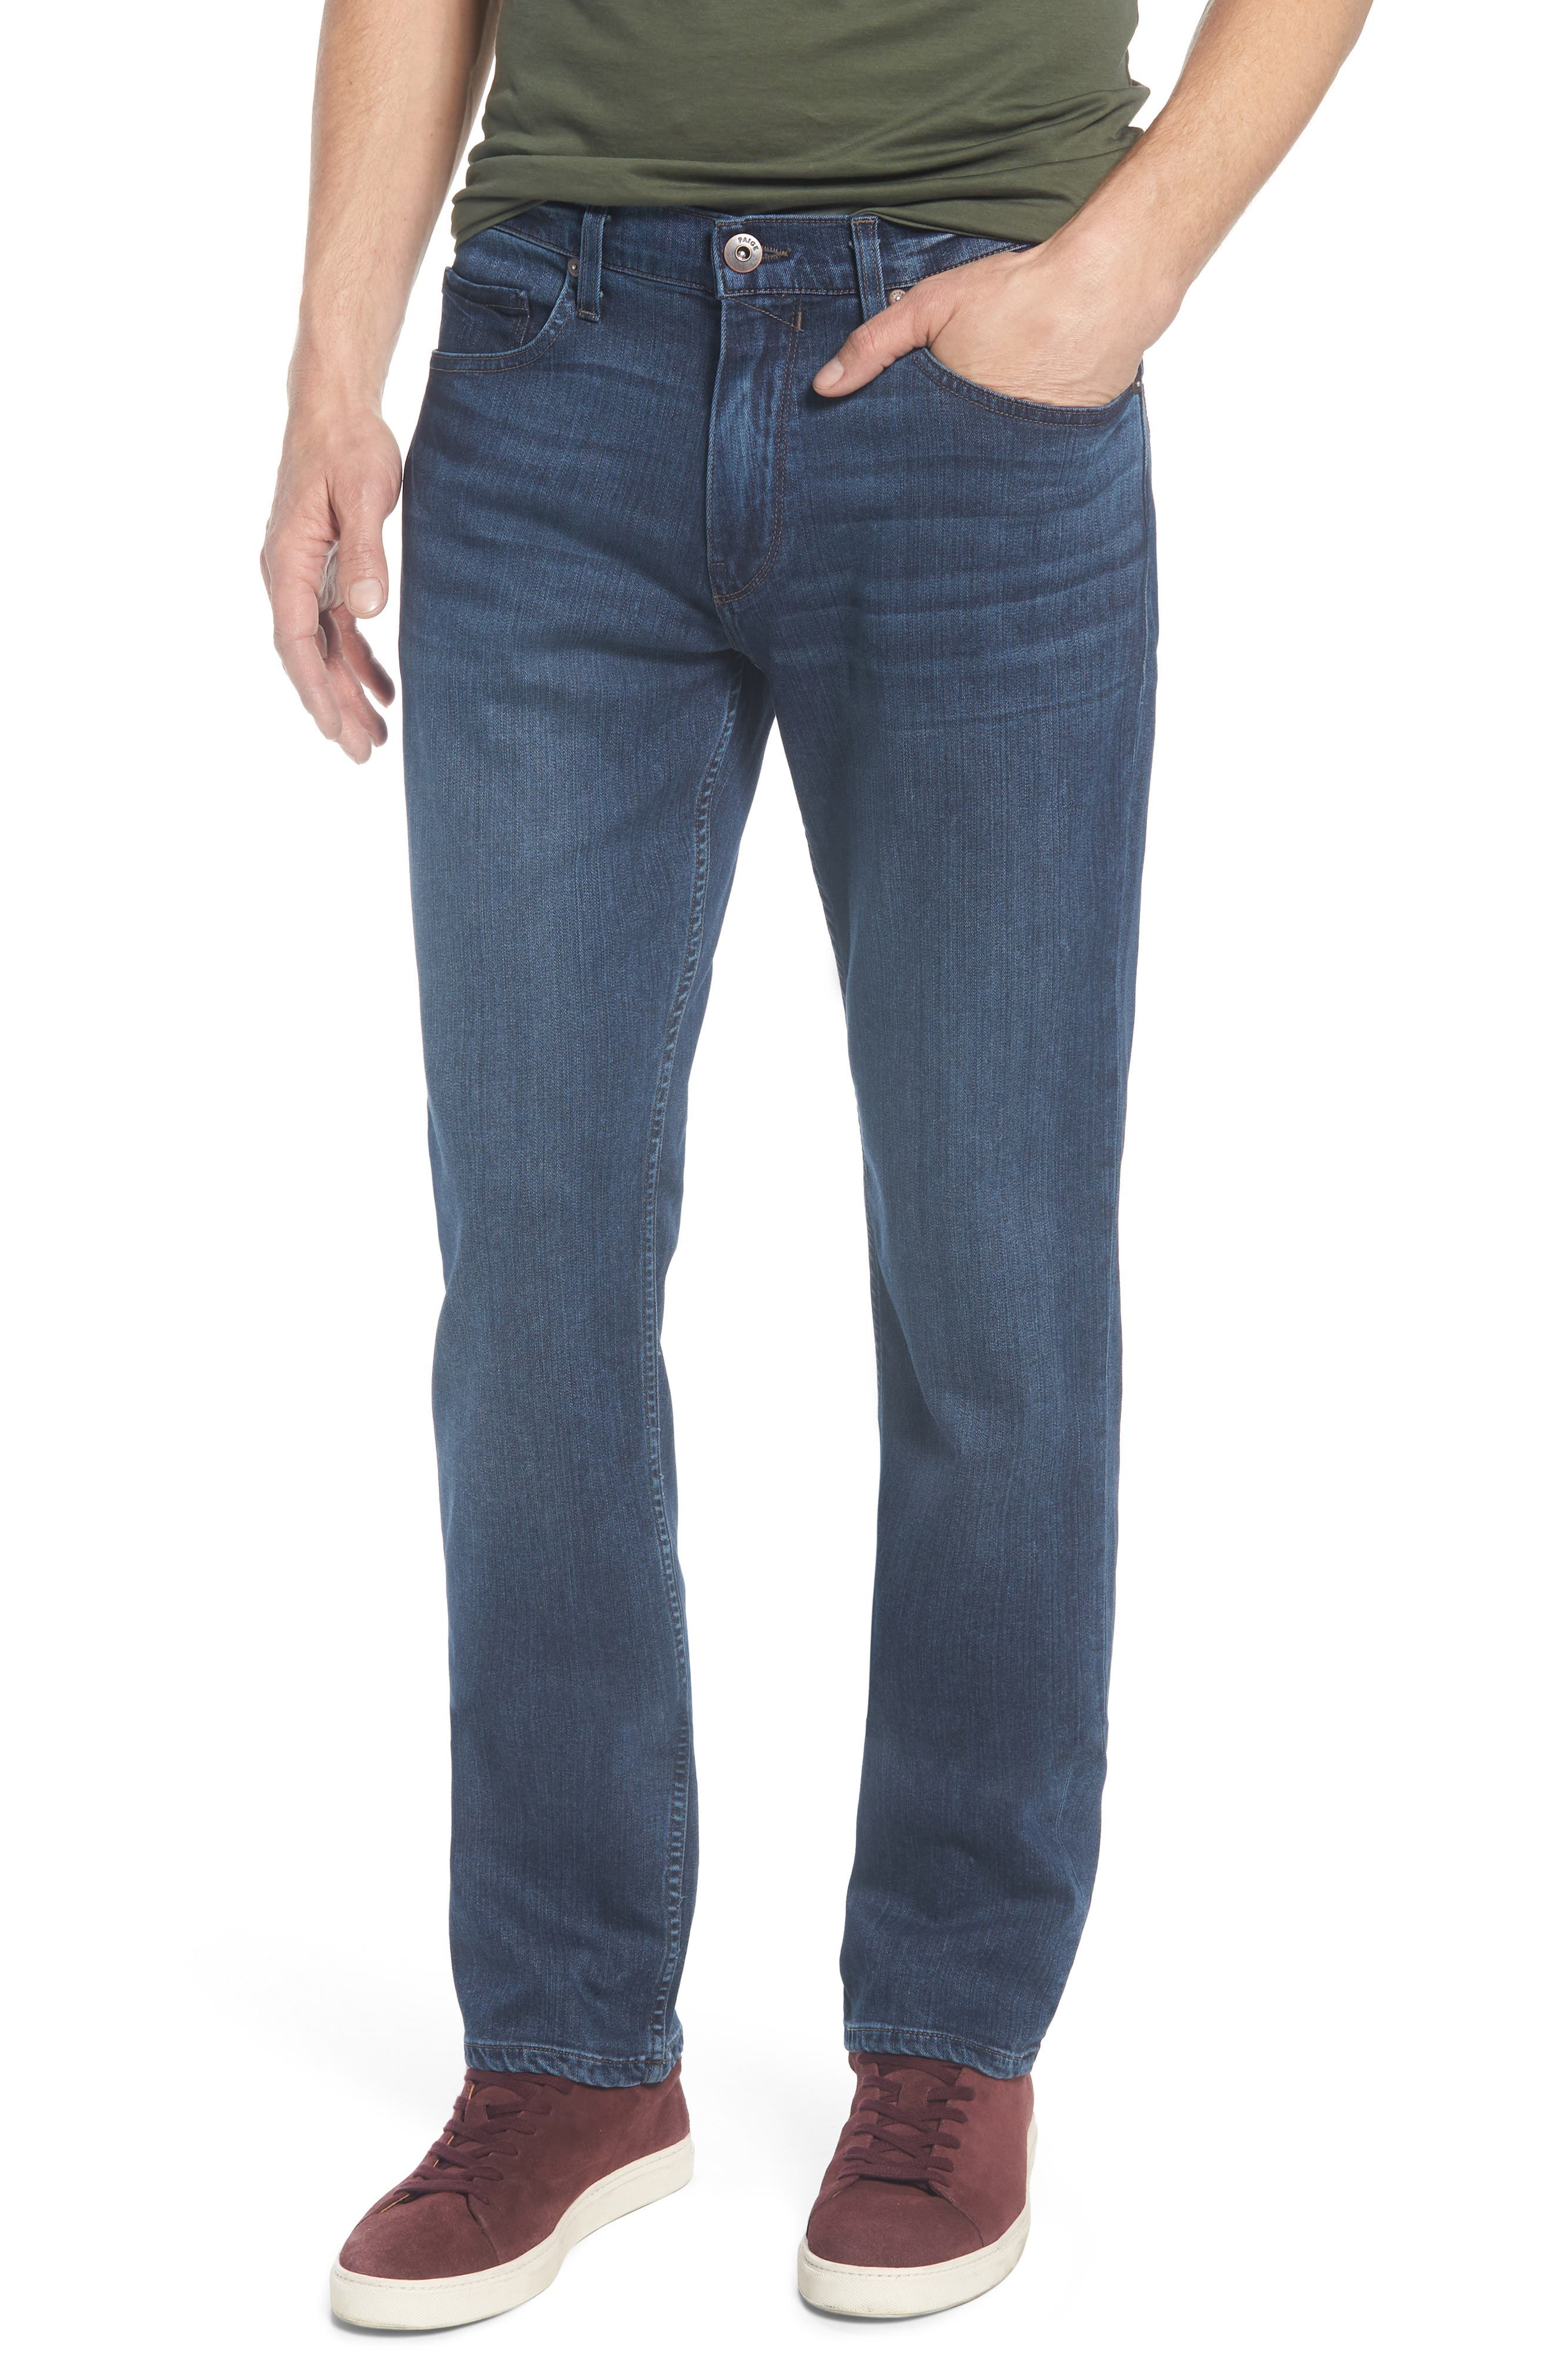 Normandie Straight Leg Jeans,                         Main,                         color, Lowe